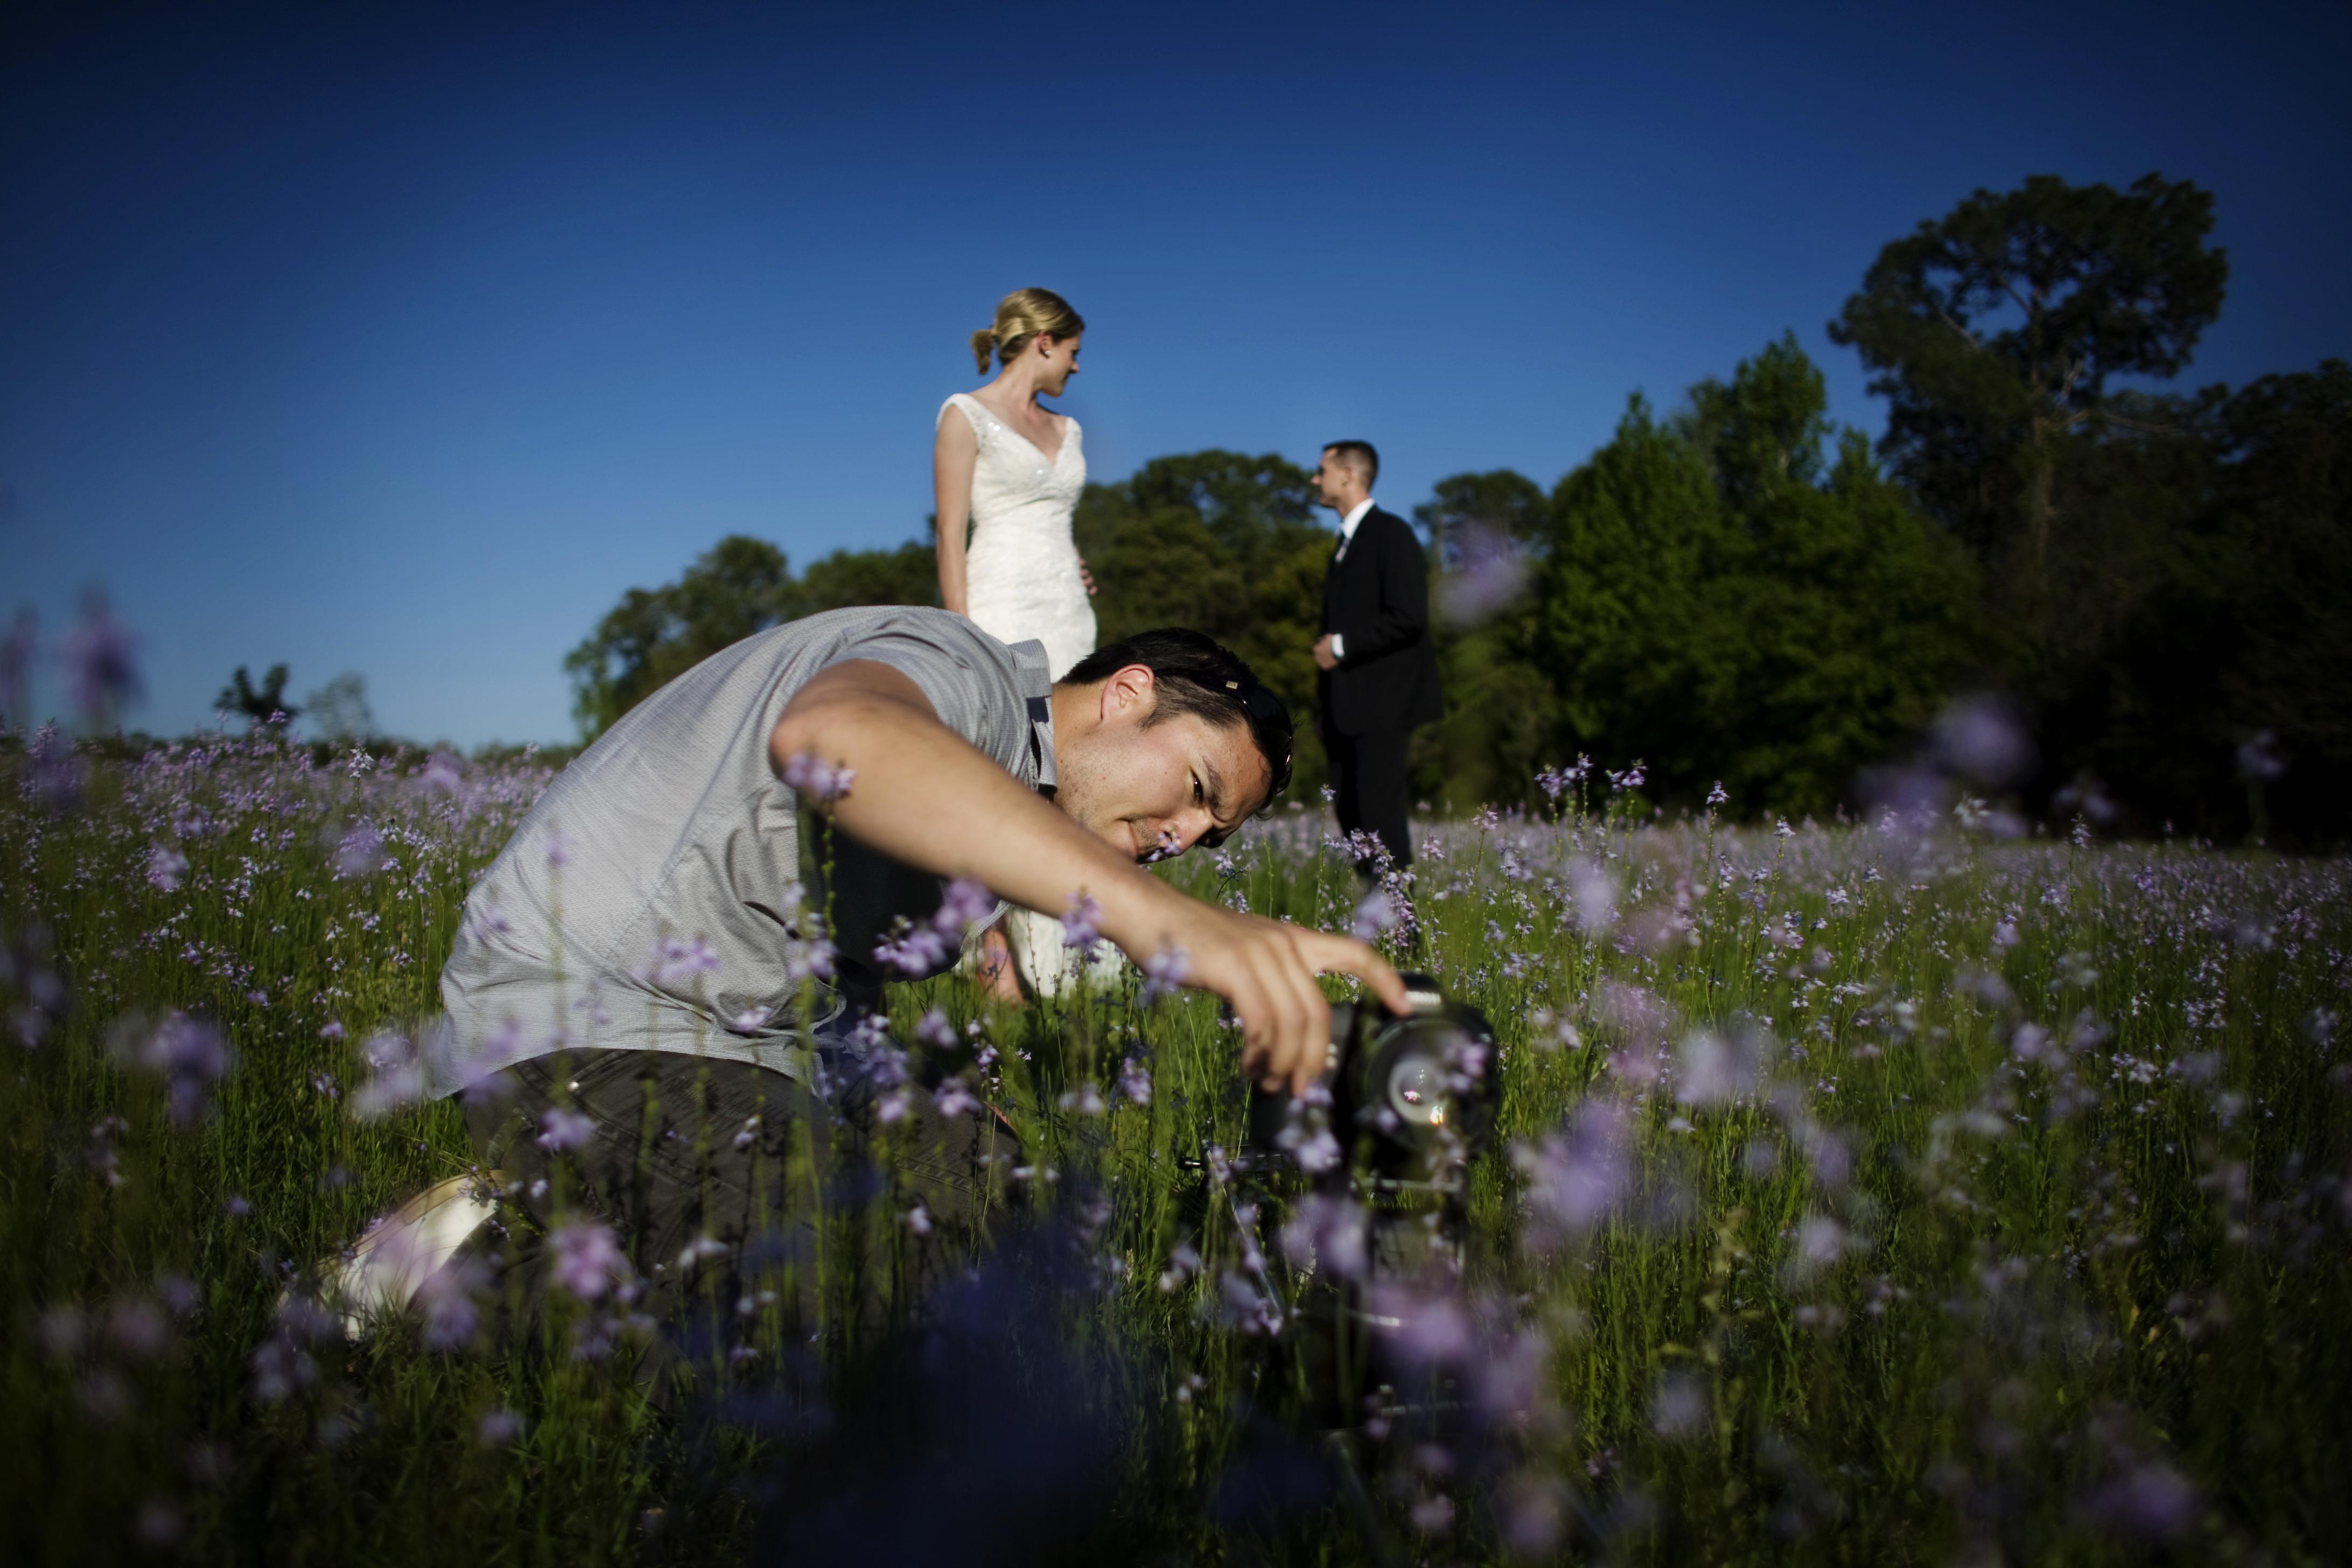 Tampa Wedding Videographer Voila Cinematic S Top 5 Wedding Advice